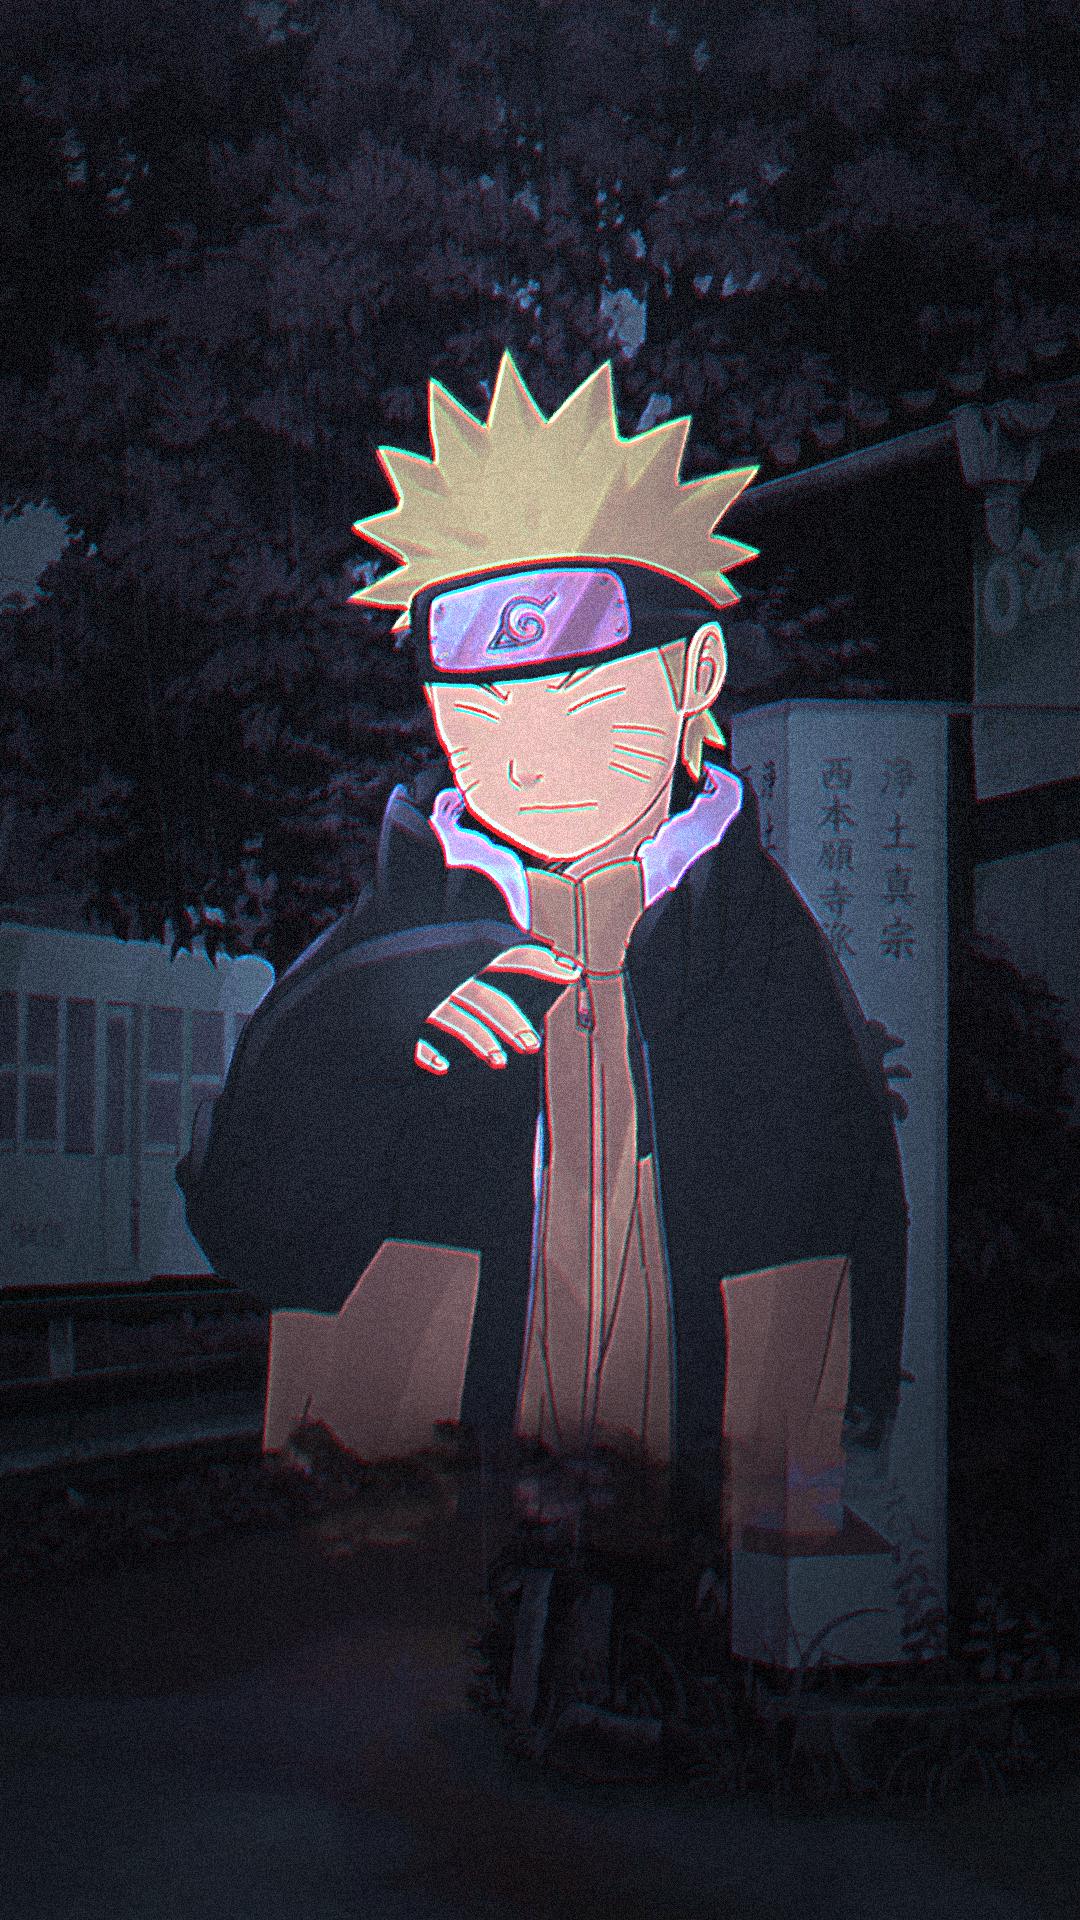 Wallpaper Naruto Anime Uzumaki Naruto Anime Boys 1080x1920 Stalker12138 1822103 Hd Wallpapers Wallhere